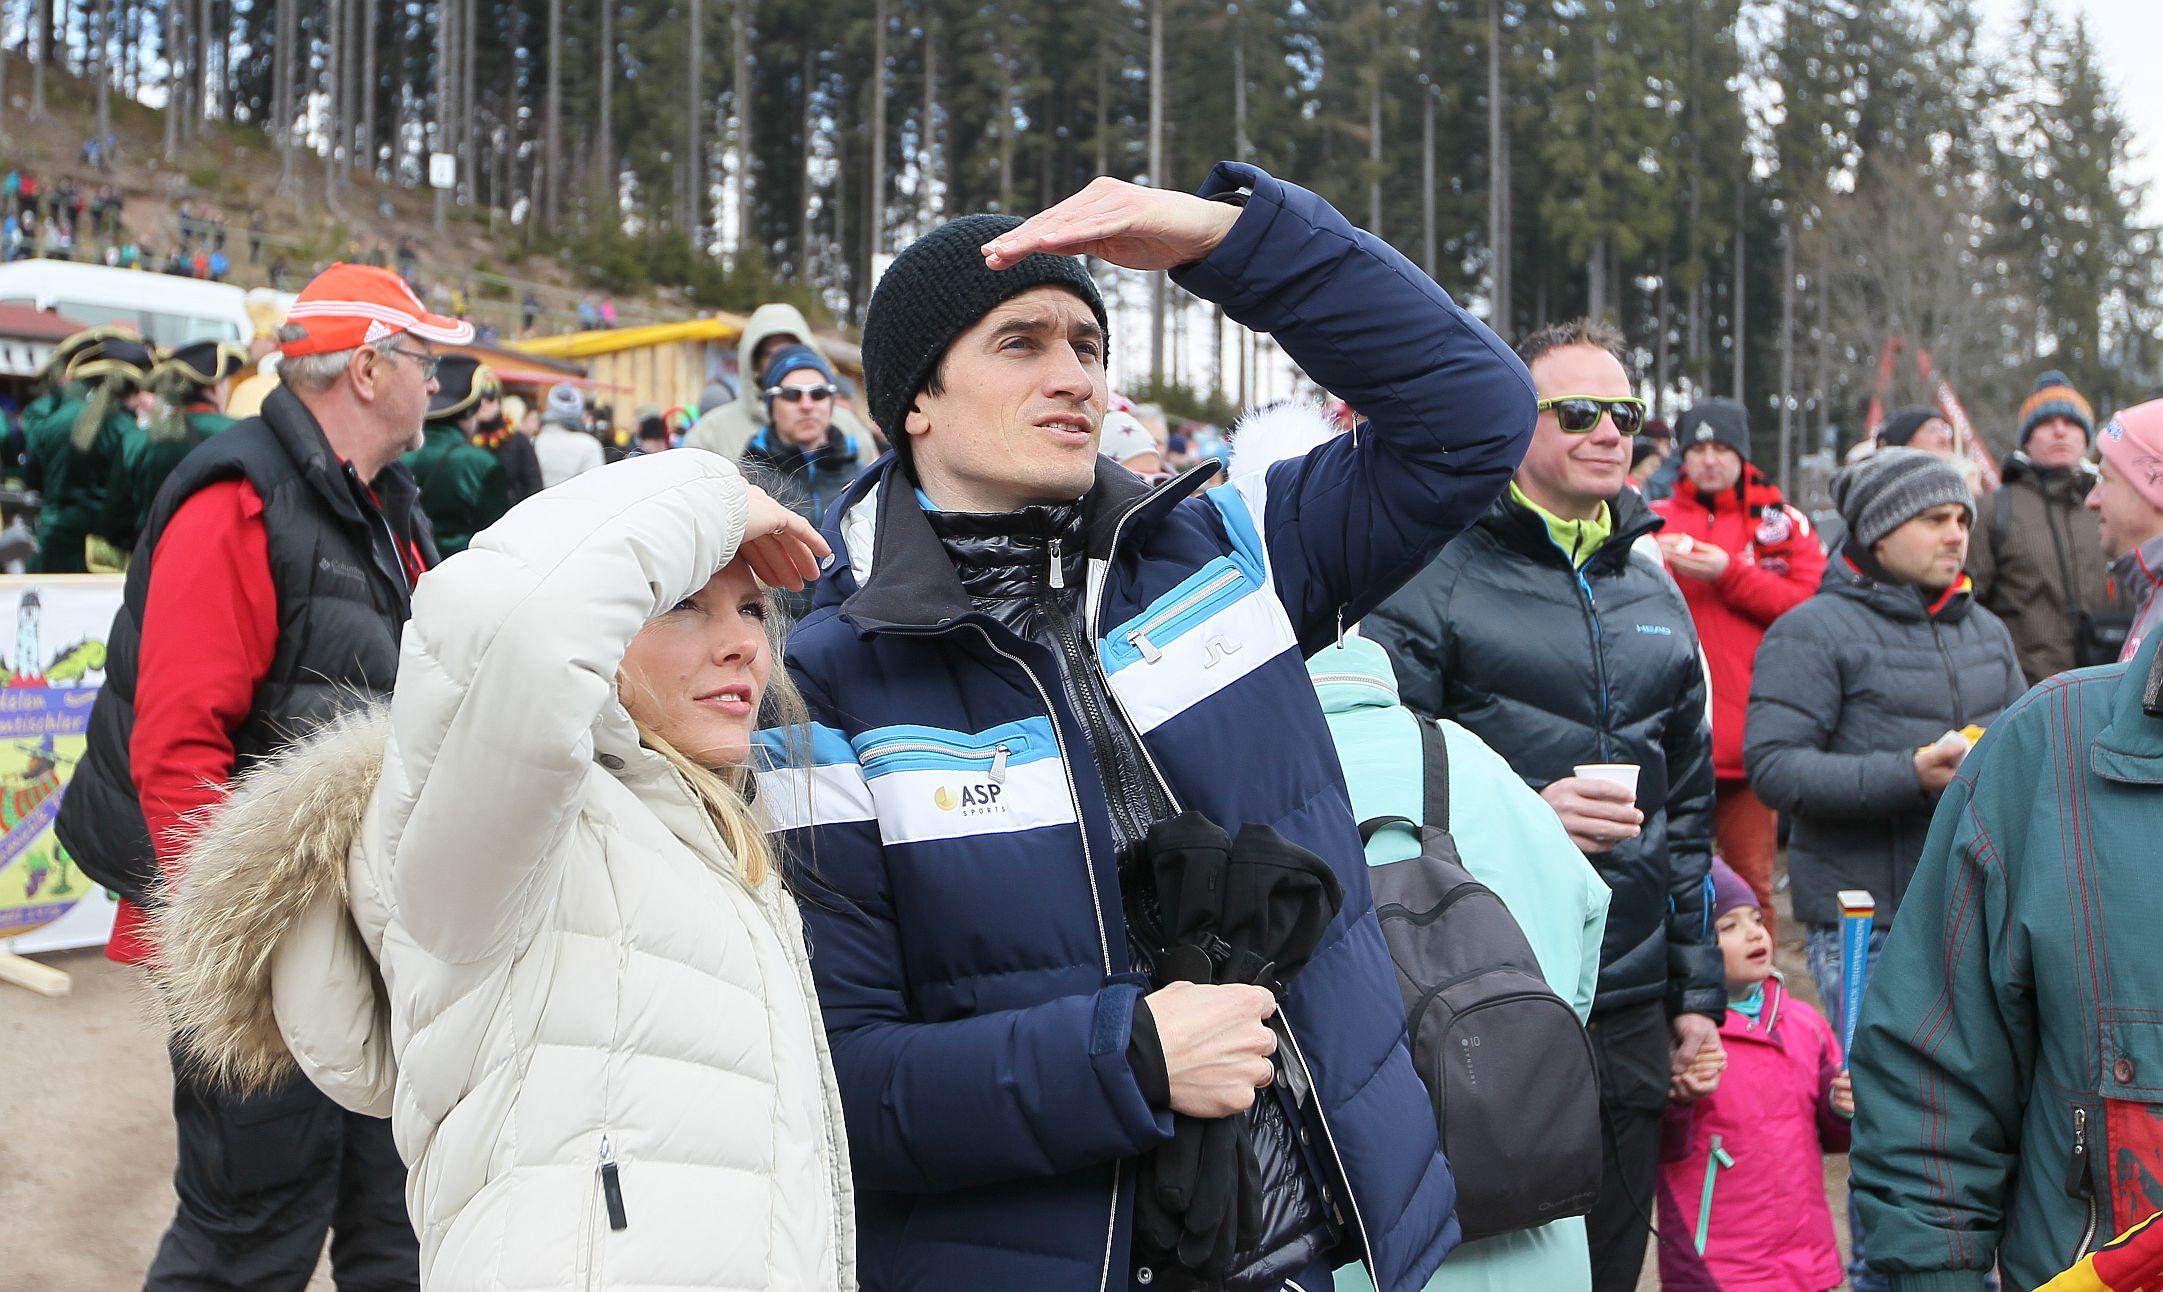 skispringen gesamtweltcup team